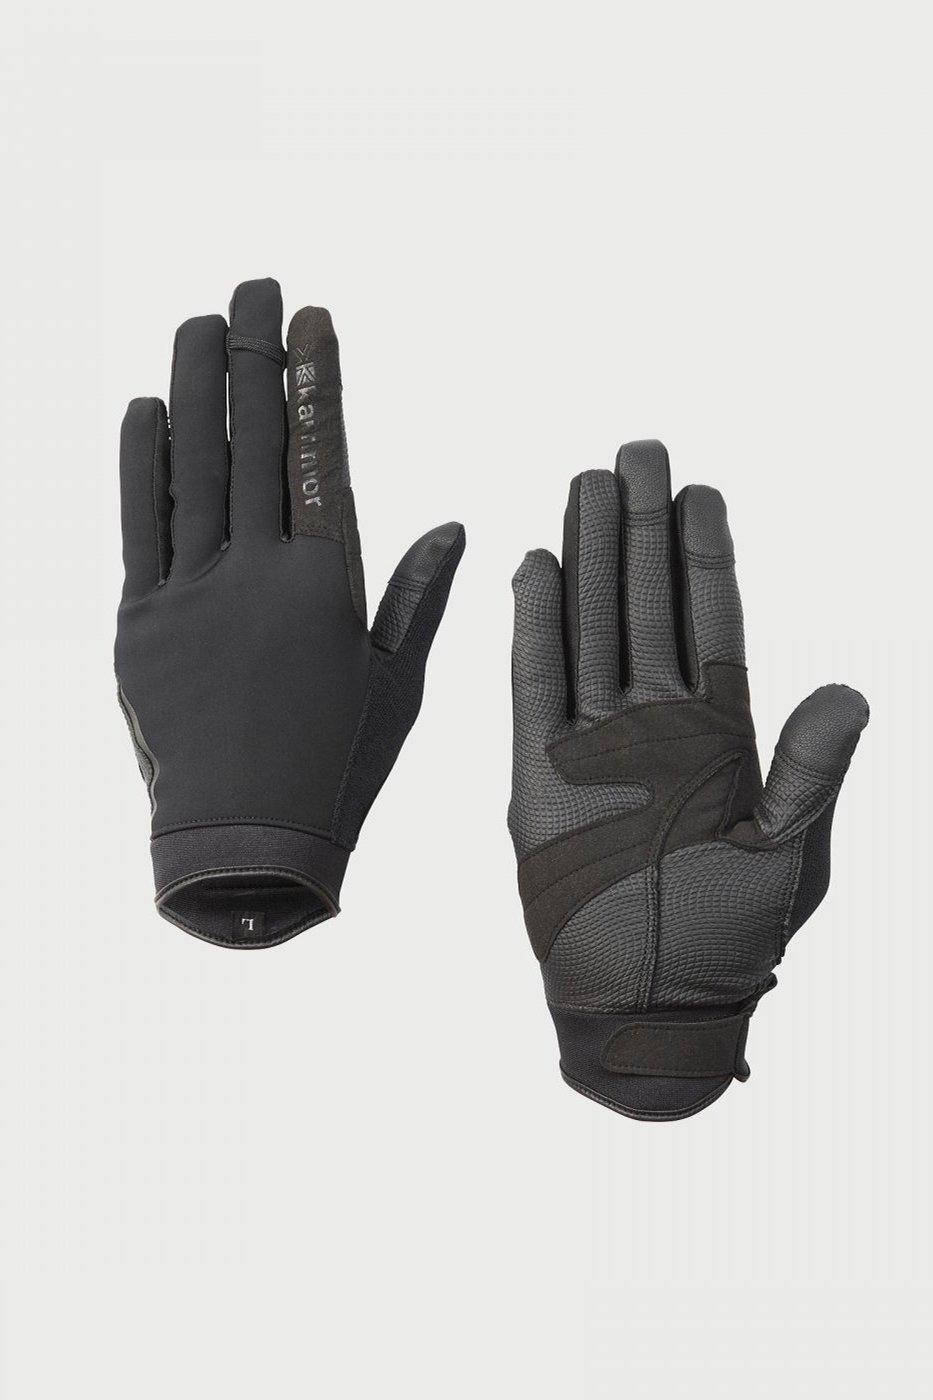 Karrimor-カリマー-technical softshell glove-BLACK-